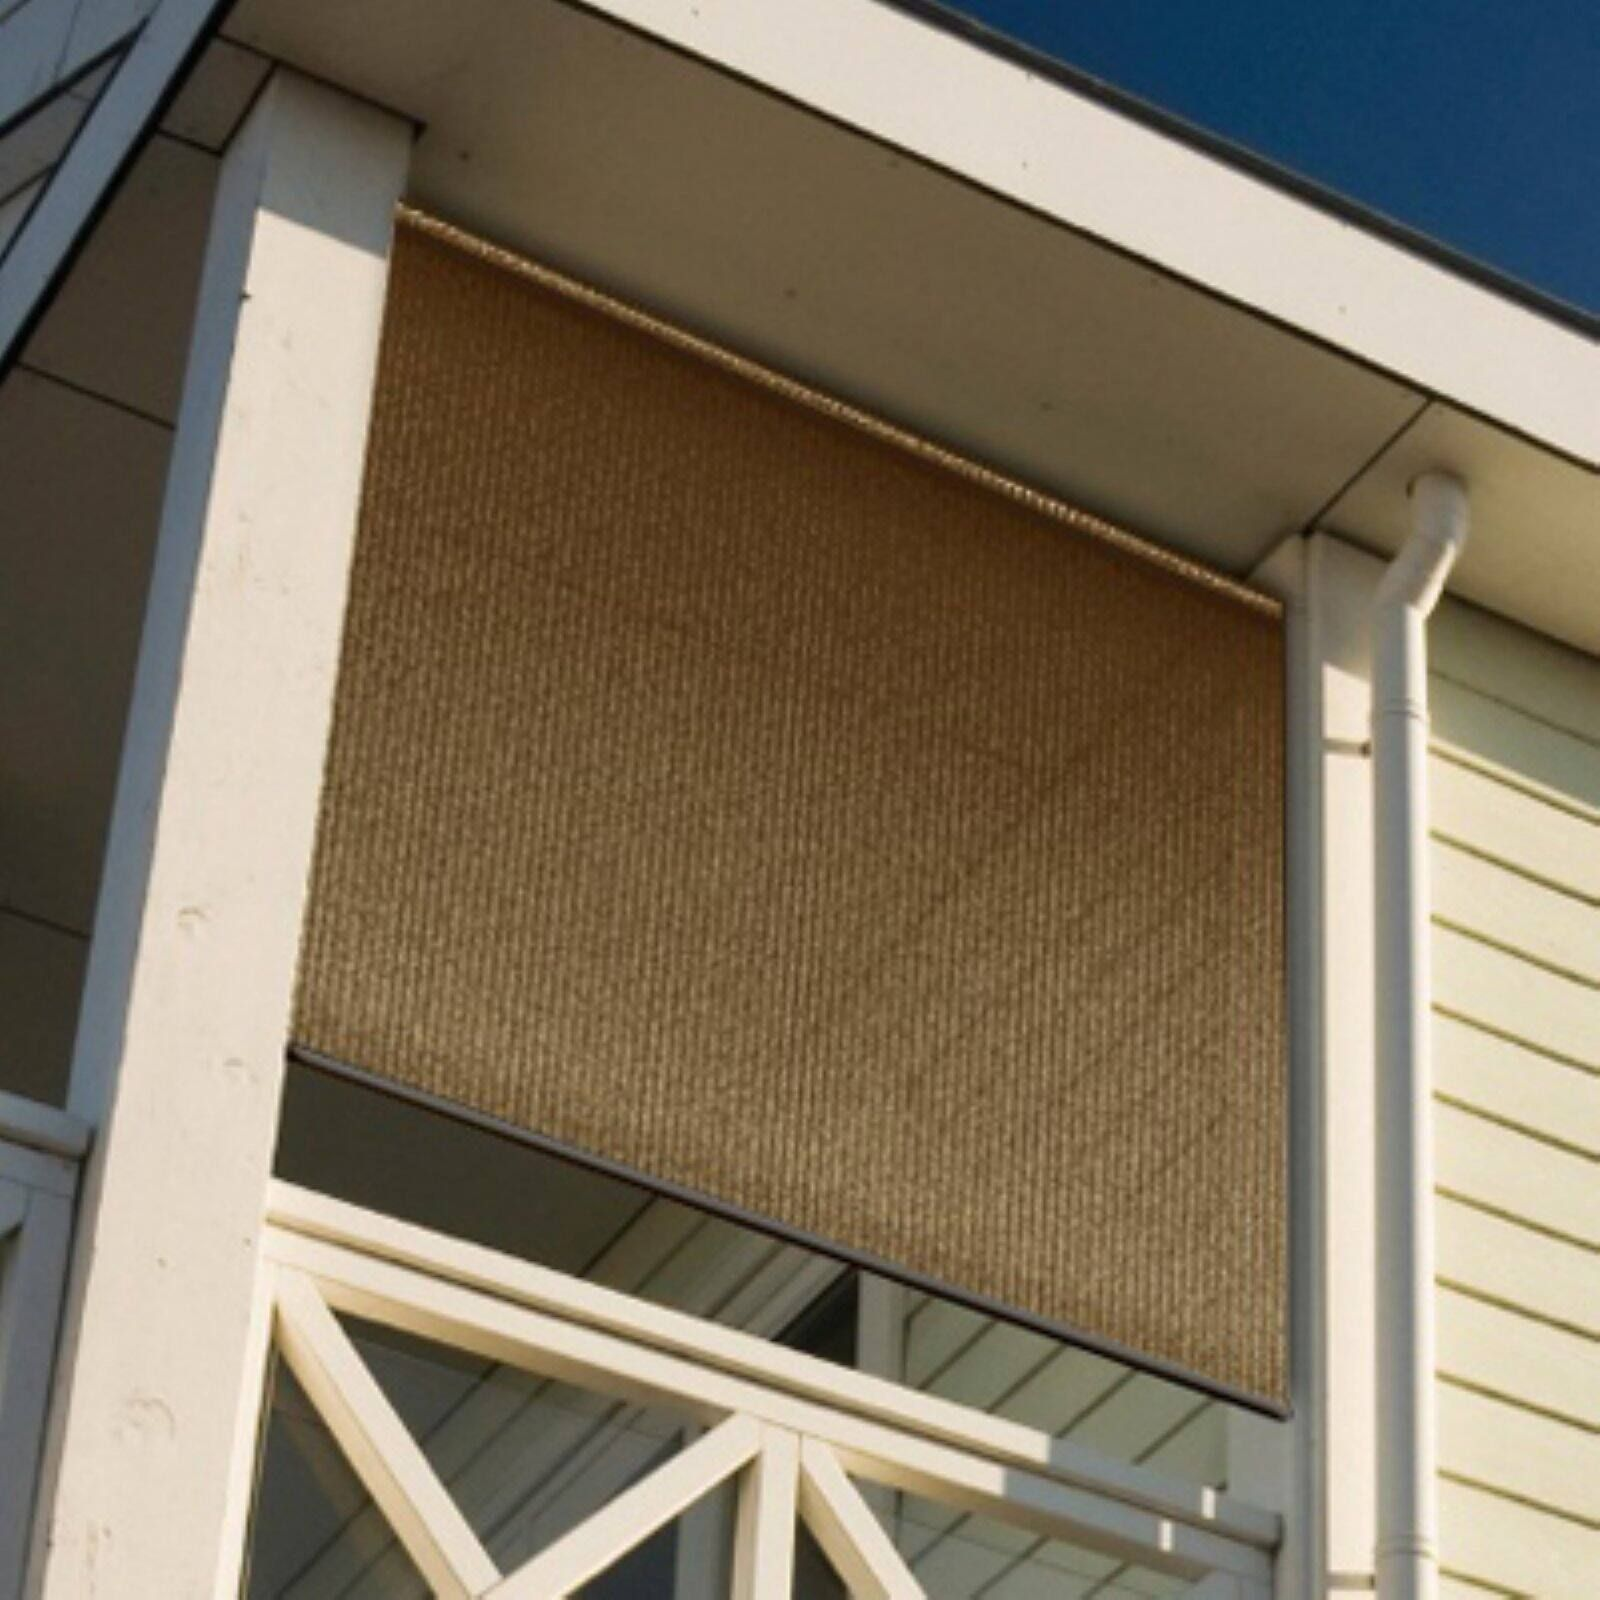 Coolaroo Wand Operated Outdoor Roller Shade 90 Uv Block 4 X 6 Mocha Walmart Com Solar Shades Outdoor Sun Shade Patio Shade